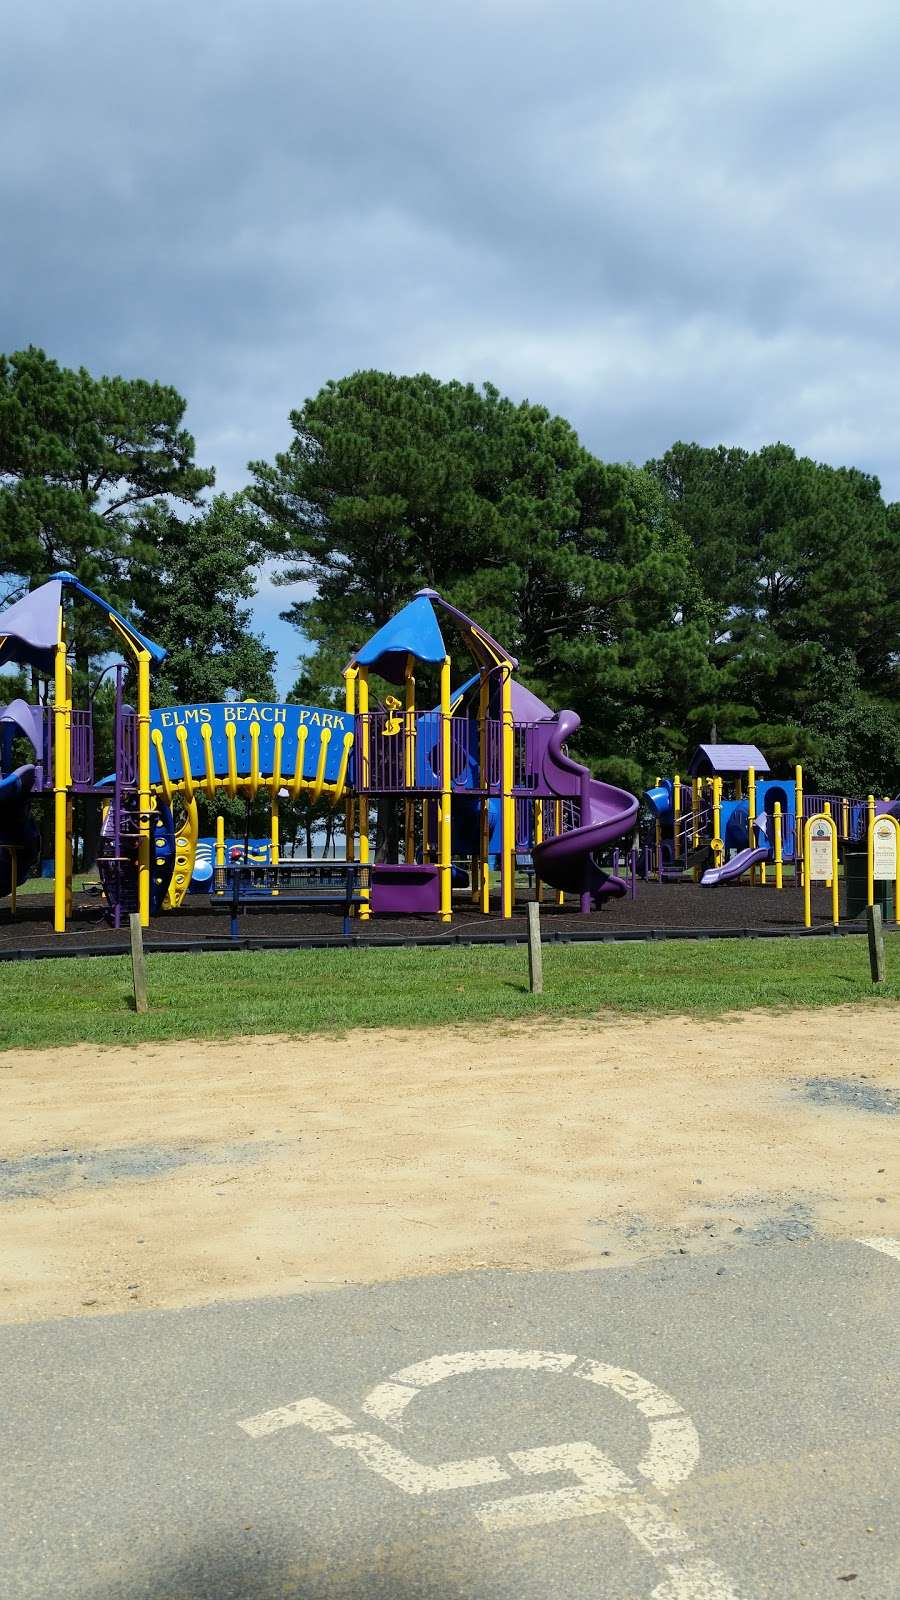 Elms Beach Park - park    Photo 1 of 10   Address: 19350 Back Door Rd, Lexington Park, MD 20653, USA   Phone: (301) 475-4200